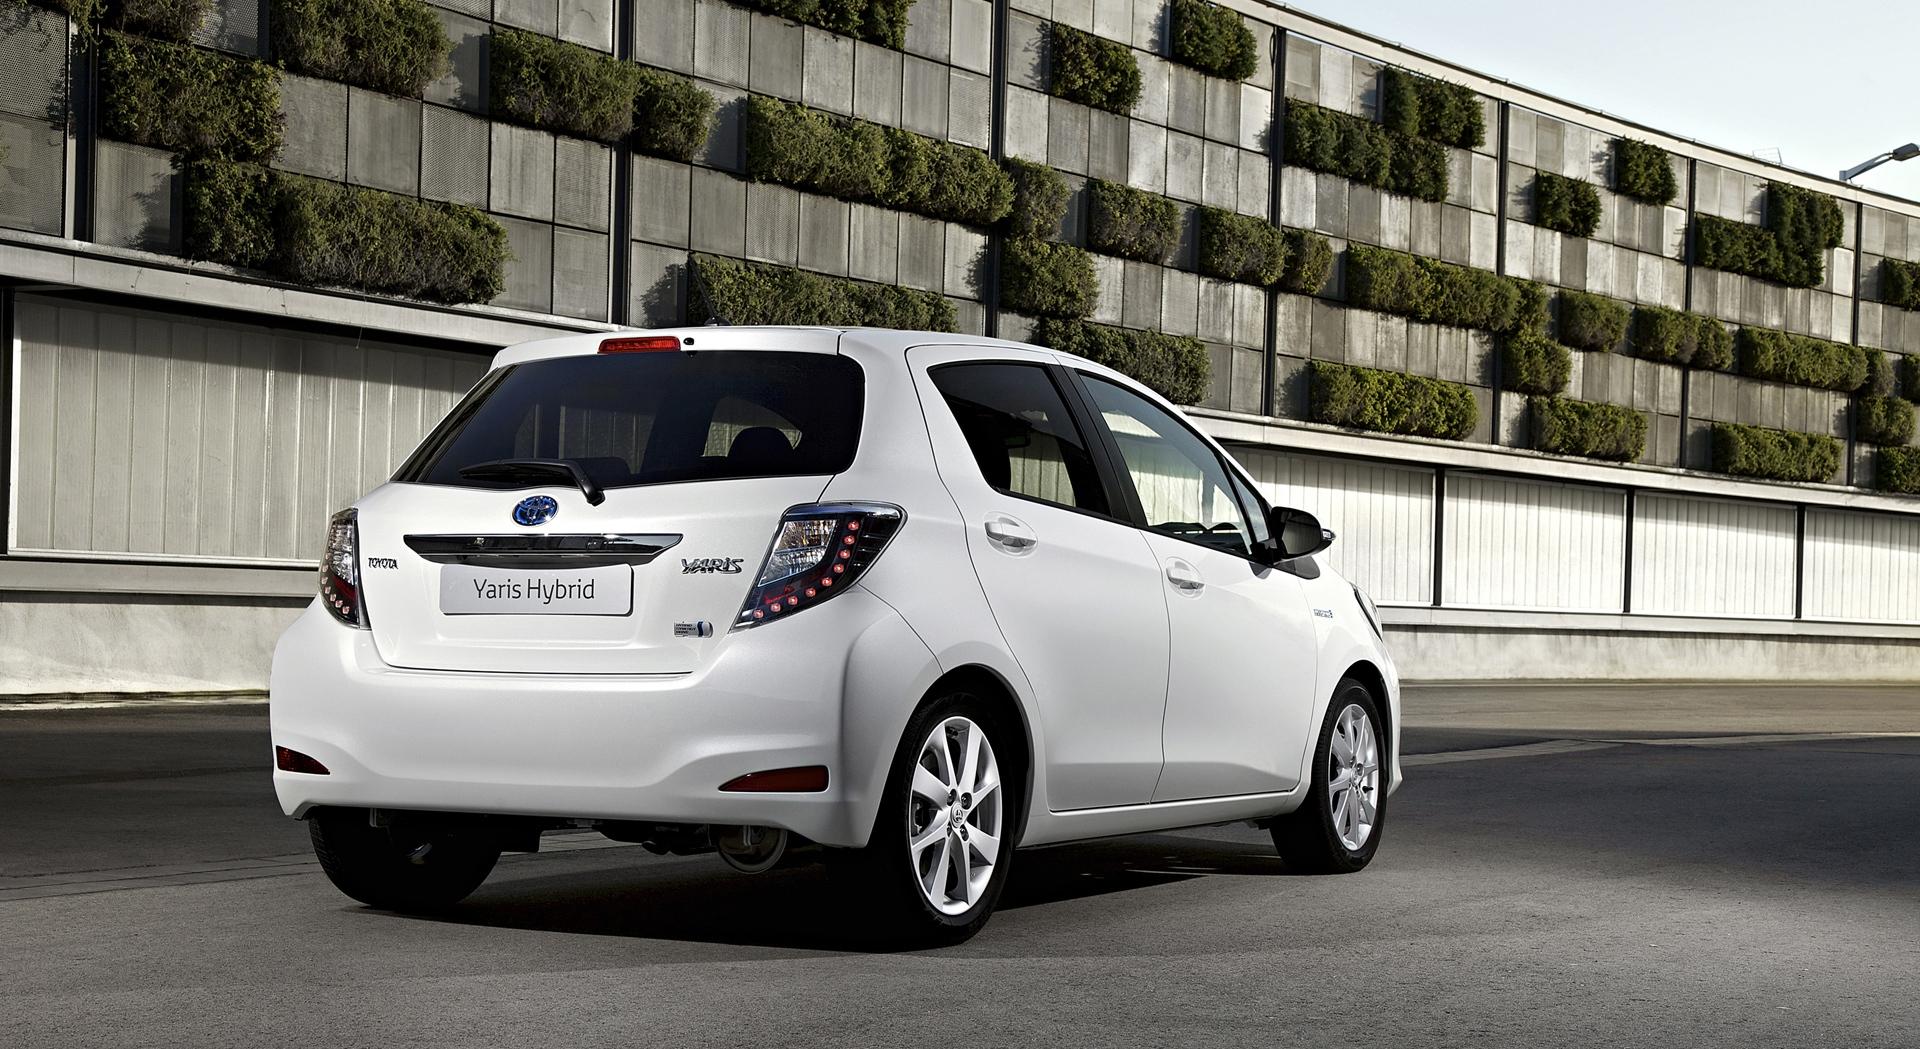 toyota yaris hybrid car